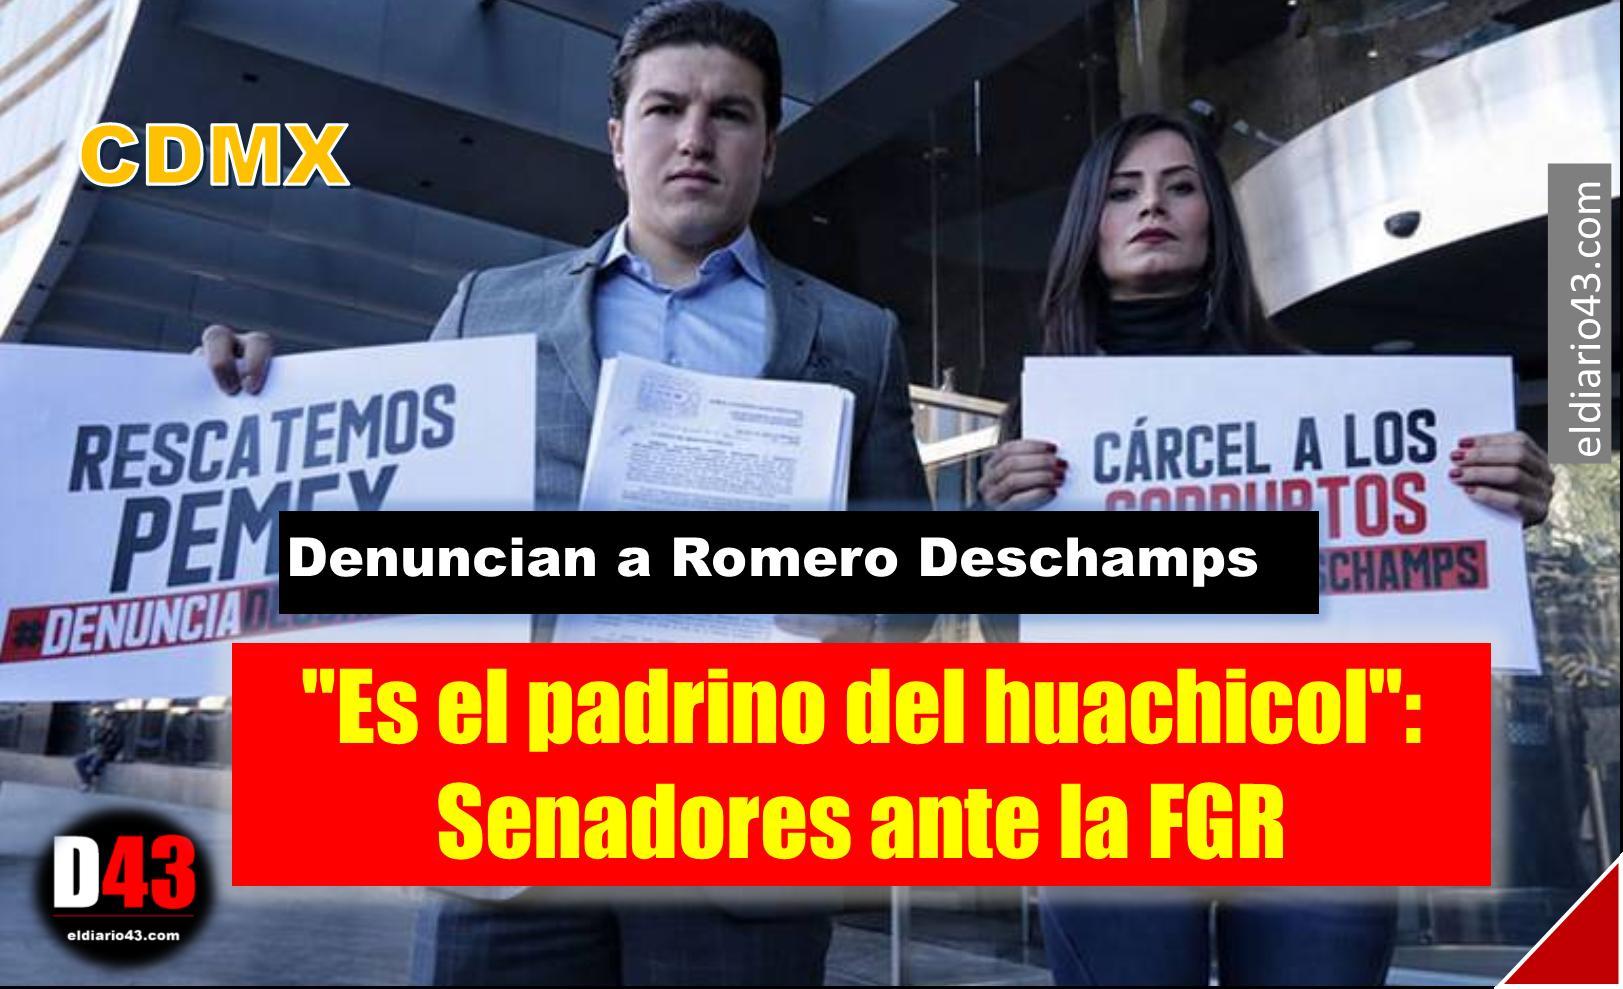 Senadores denuncian a Romero Deschamps ante la FGR por 11 delitos